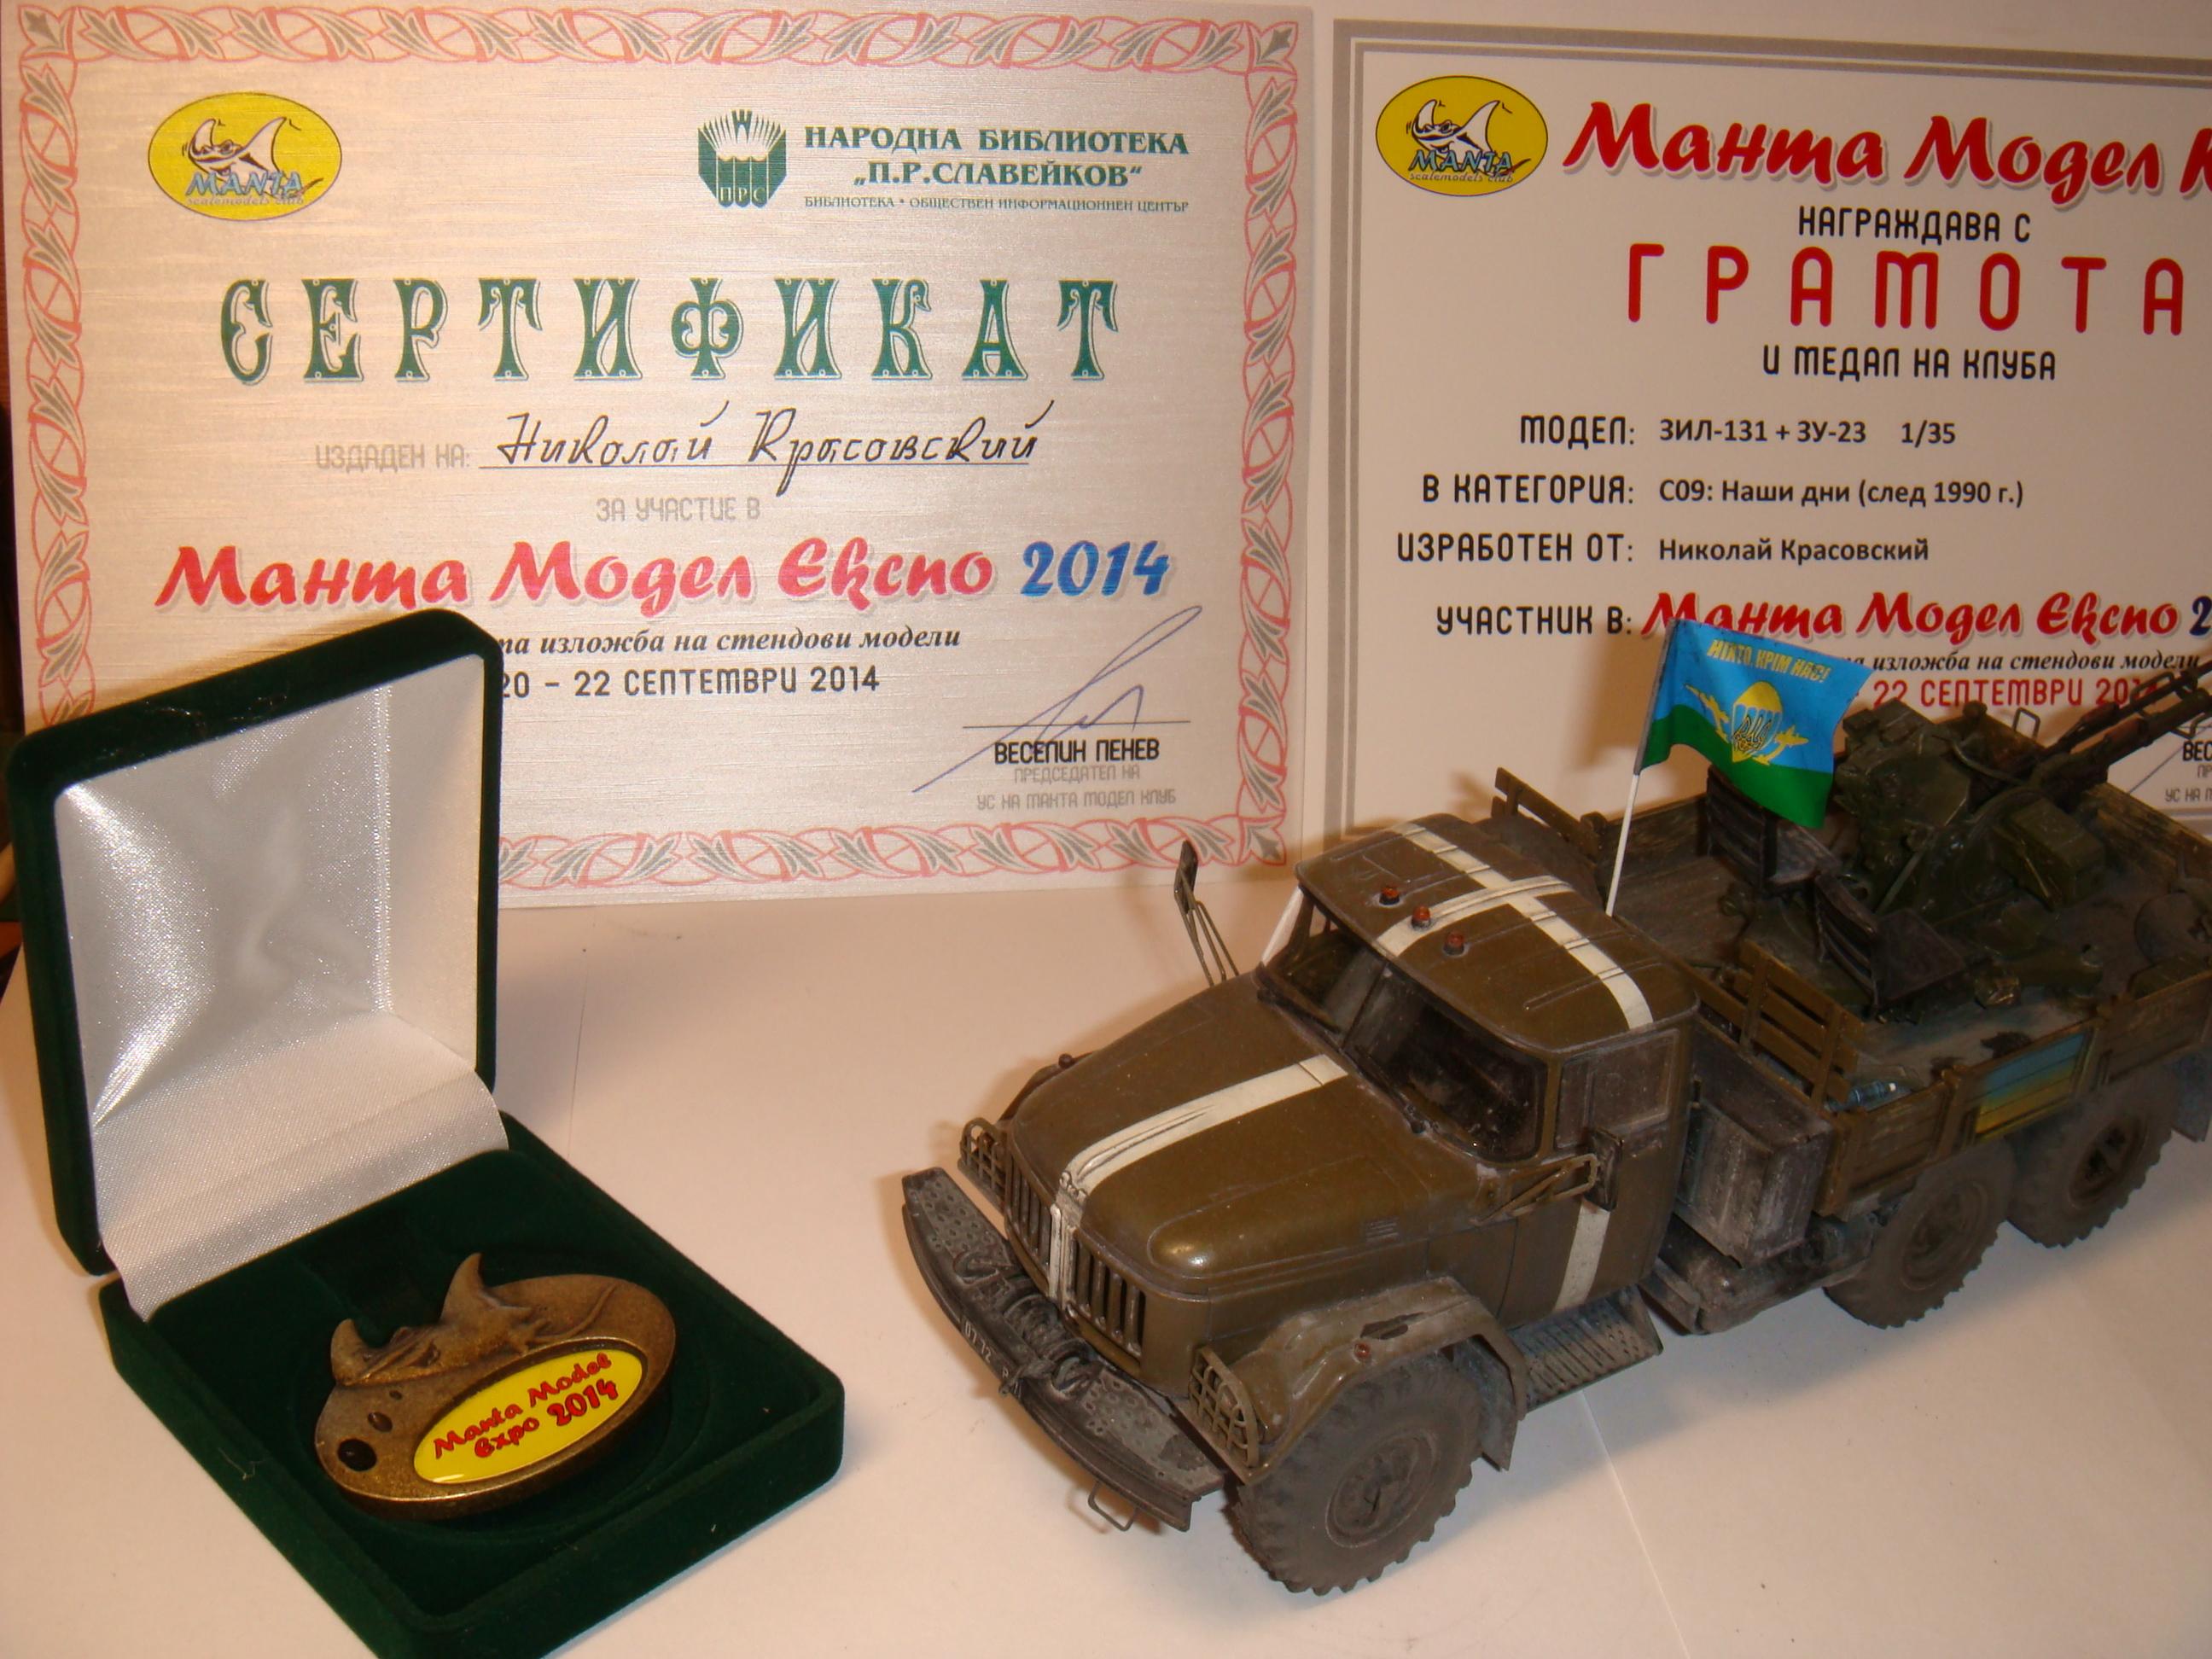 http://se.uploads.ru/1pyfI.jpg